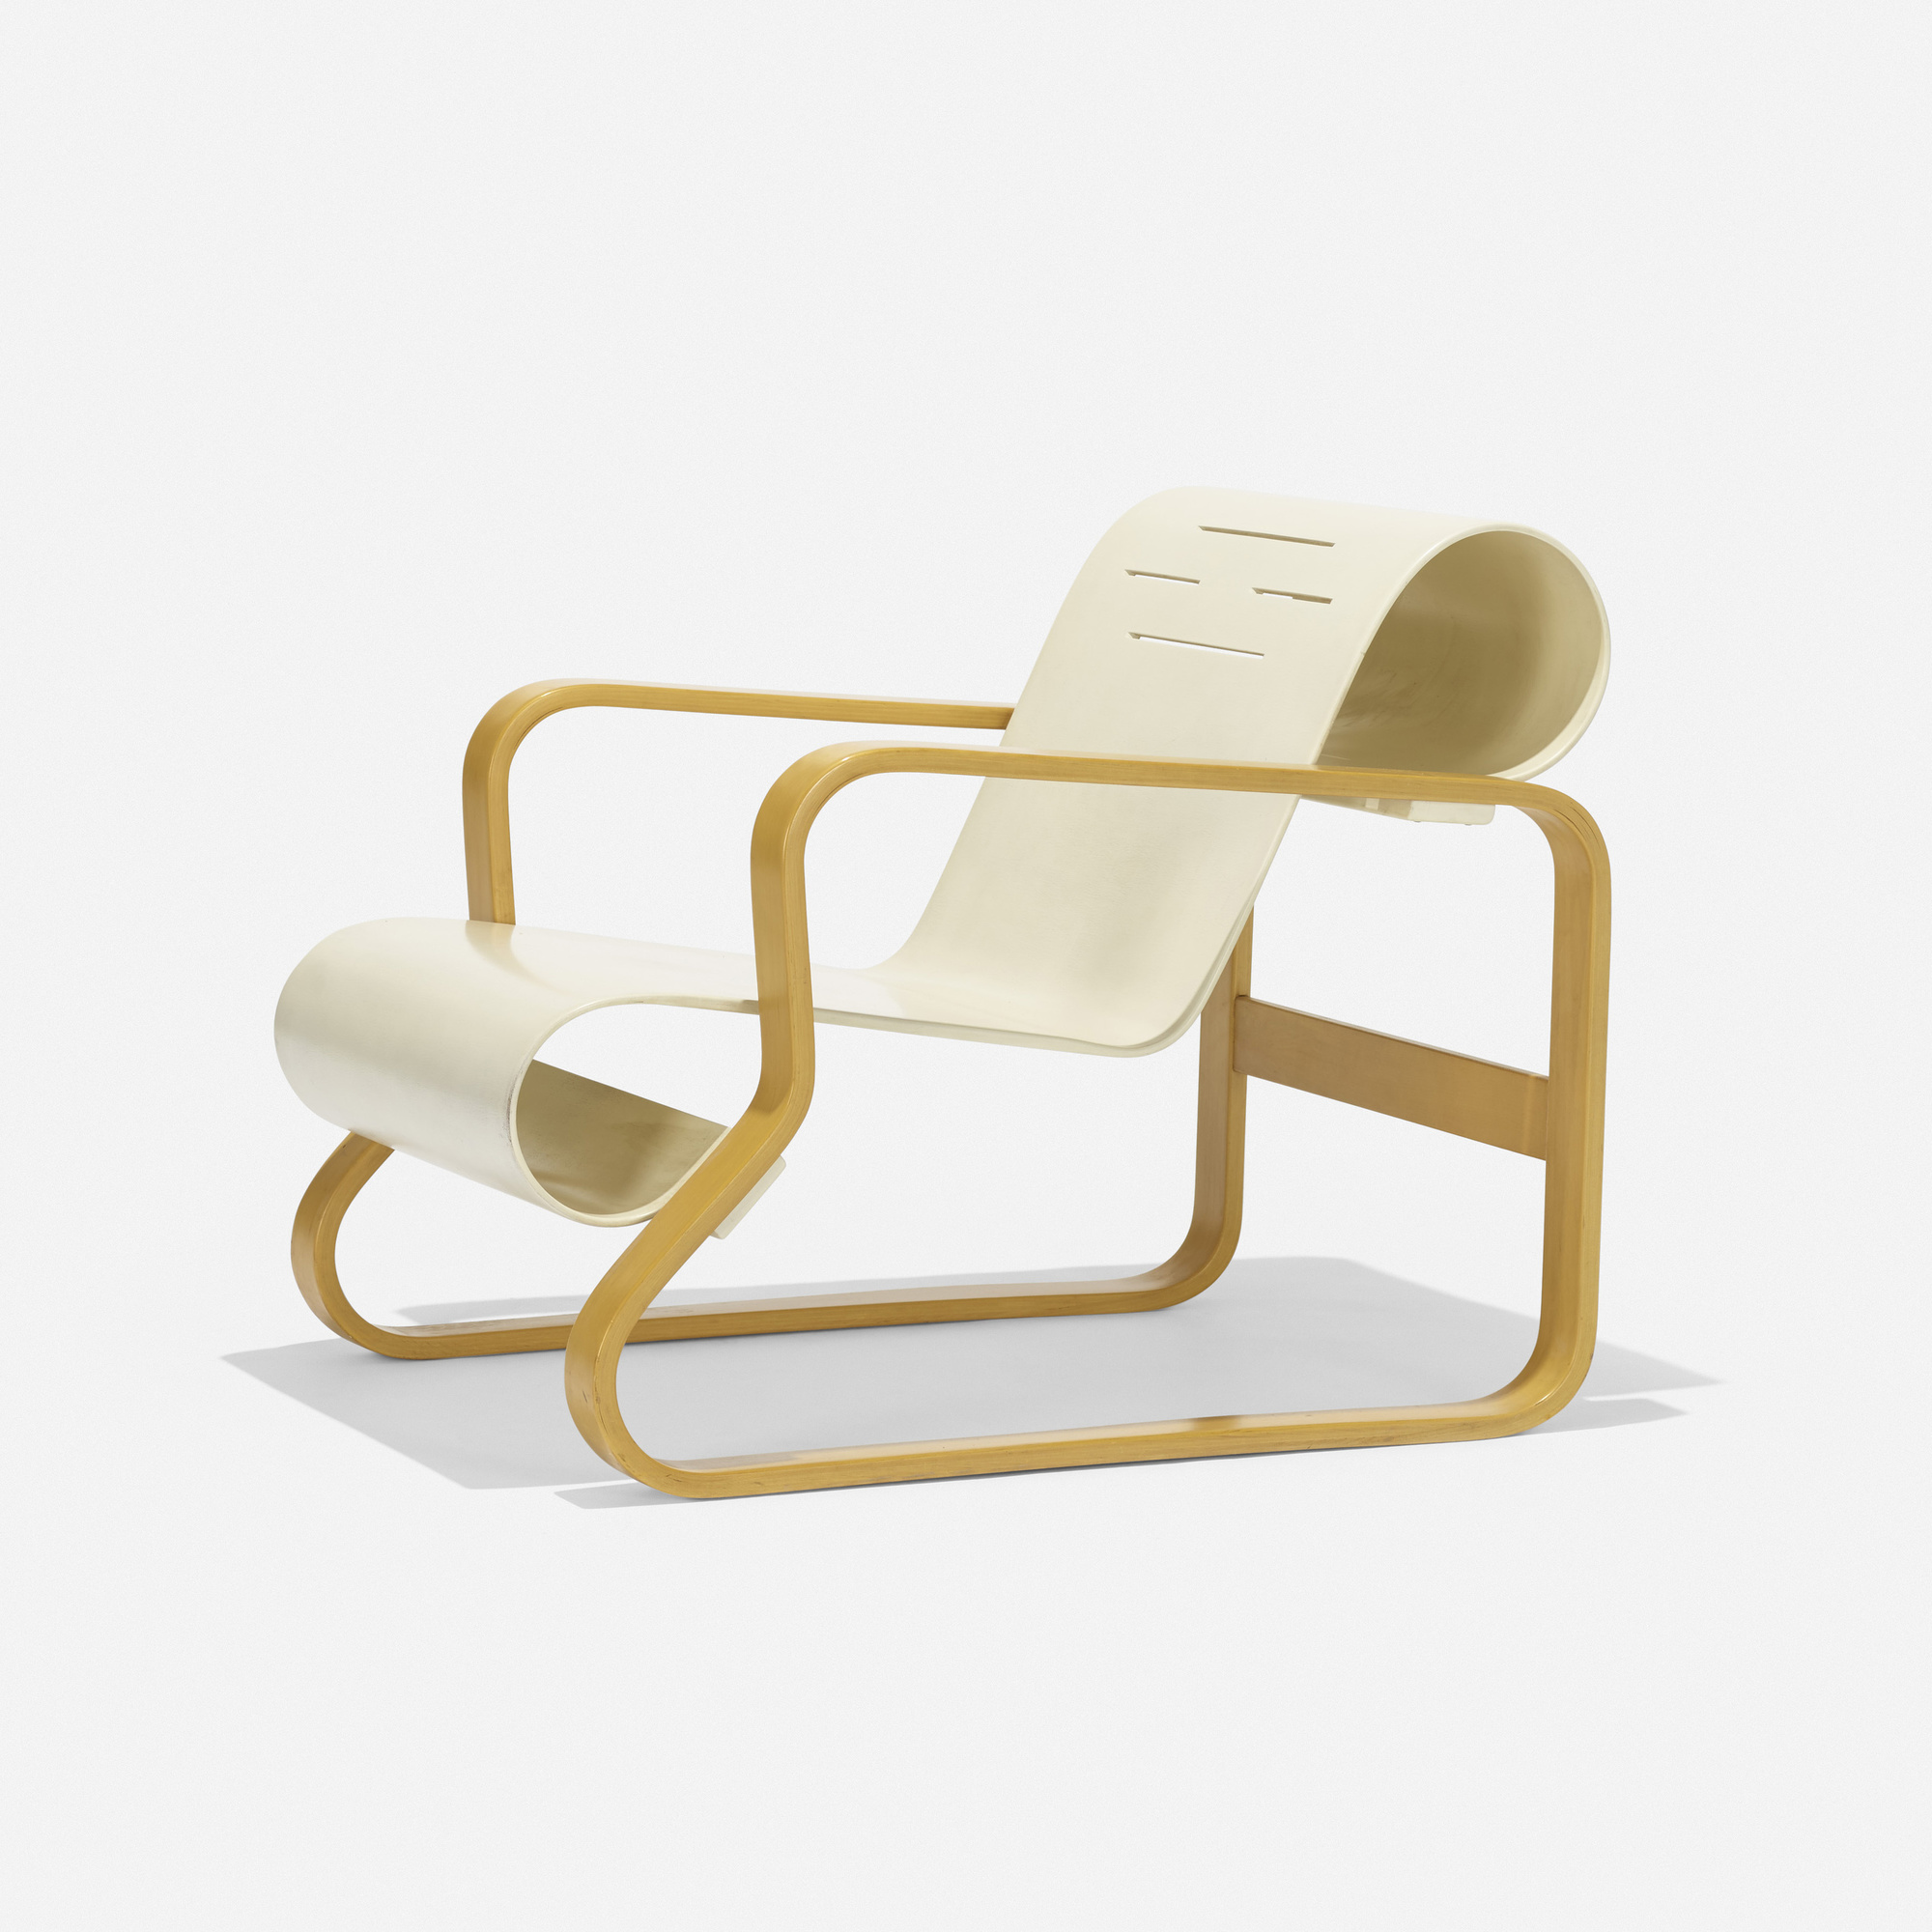 106: Alvar Aalto / Paimio lounge chair (1 of 2)